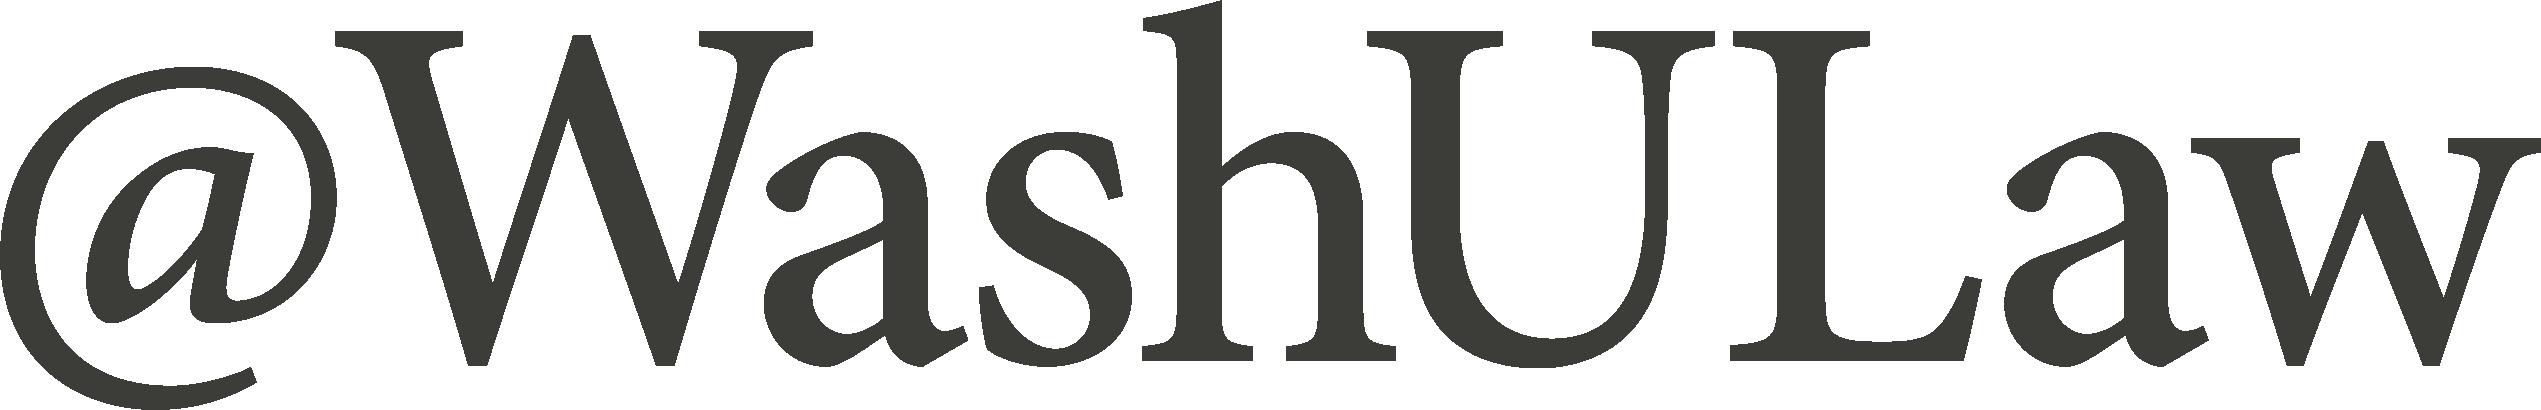 Washington University in St. Louis Online Law Degree Programs - home